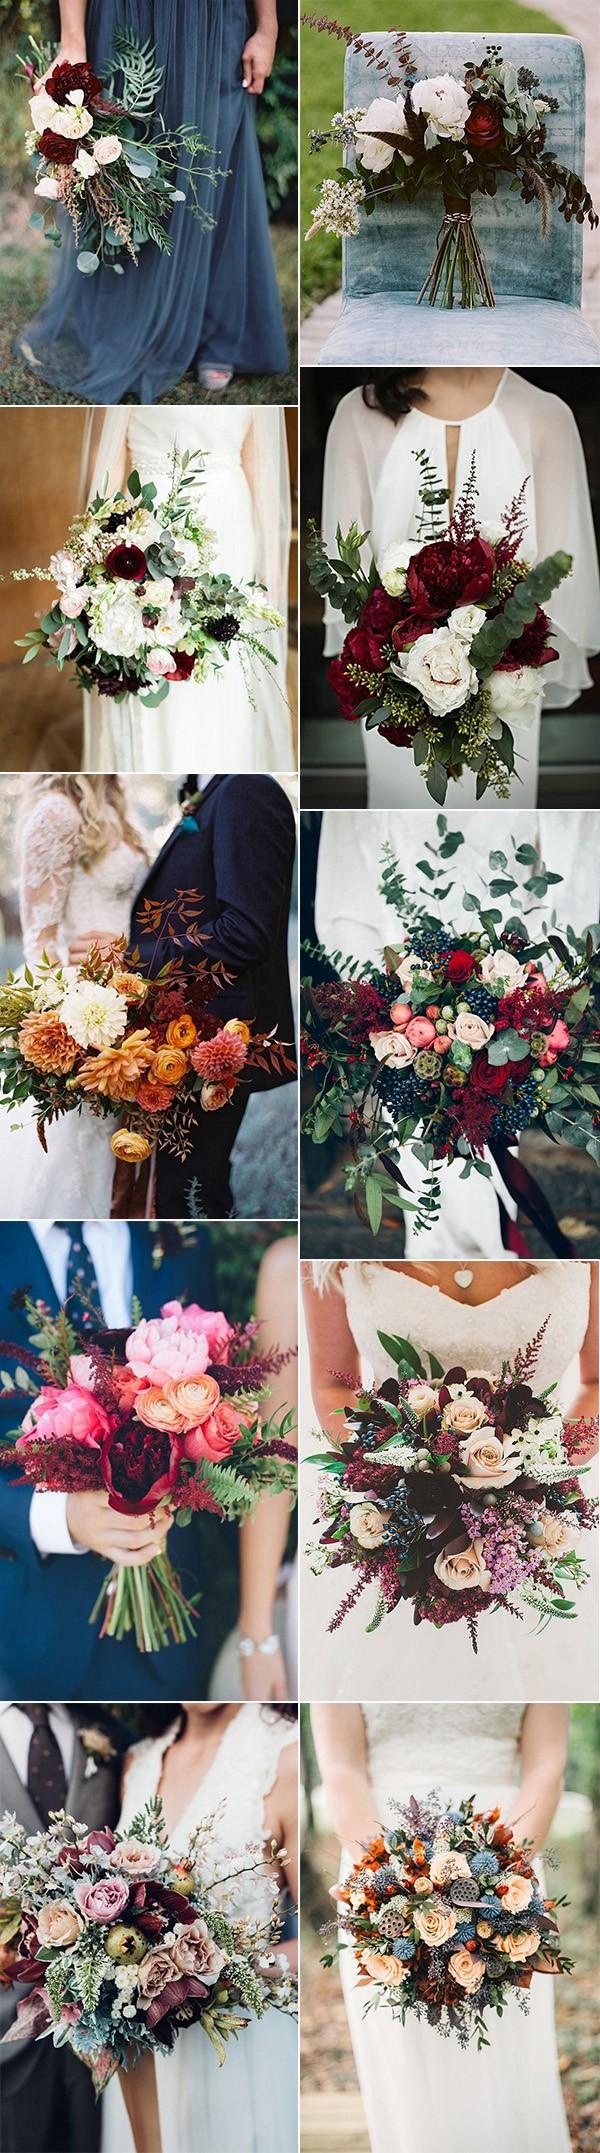 fall wedding bouquet ideas for 2018 trends